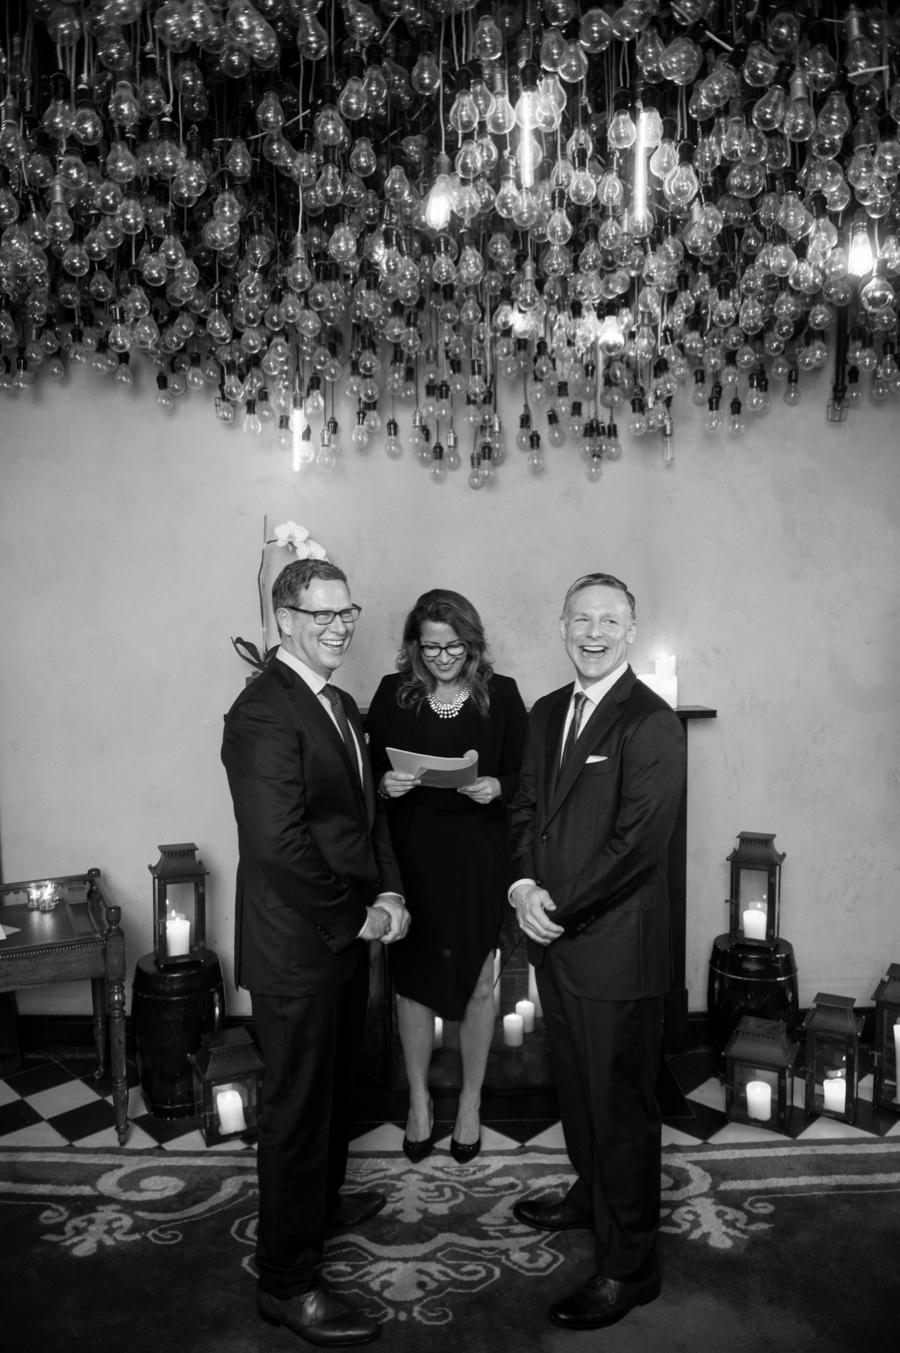 RKP_GRAMERCY_PARK_HOTEL_NYC_WEDDING032.jpg